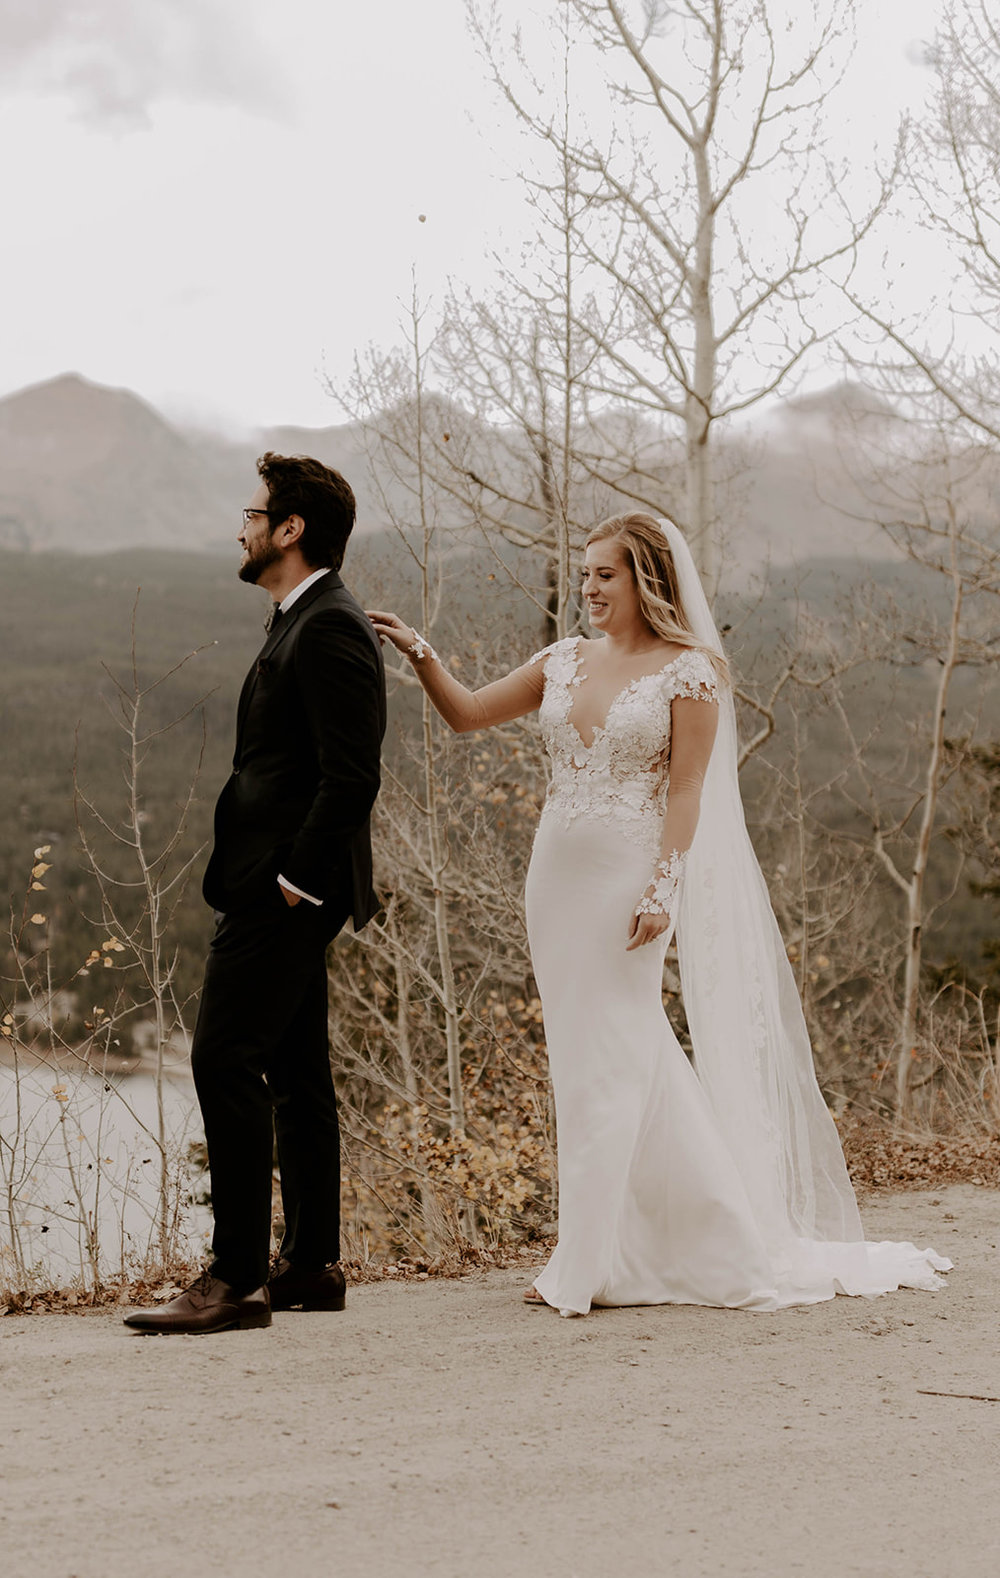 karra leigh photography- jenny and julio wedding112.jpg